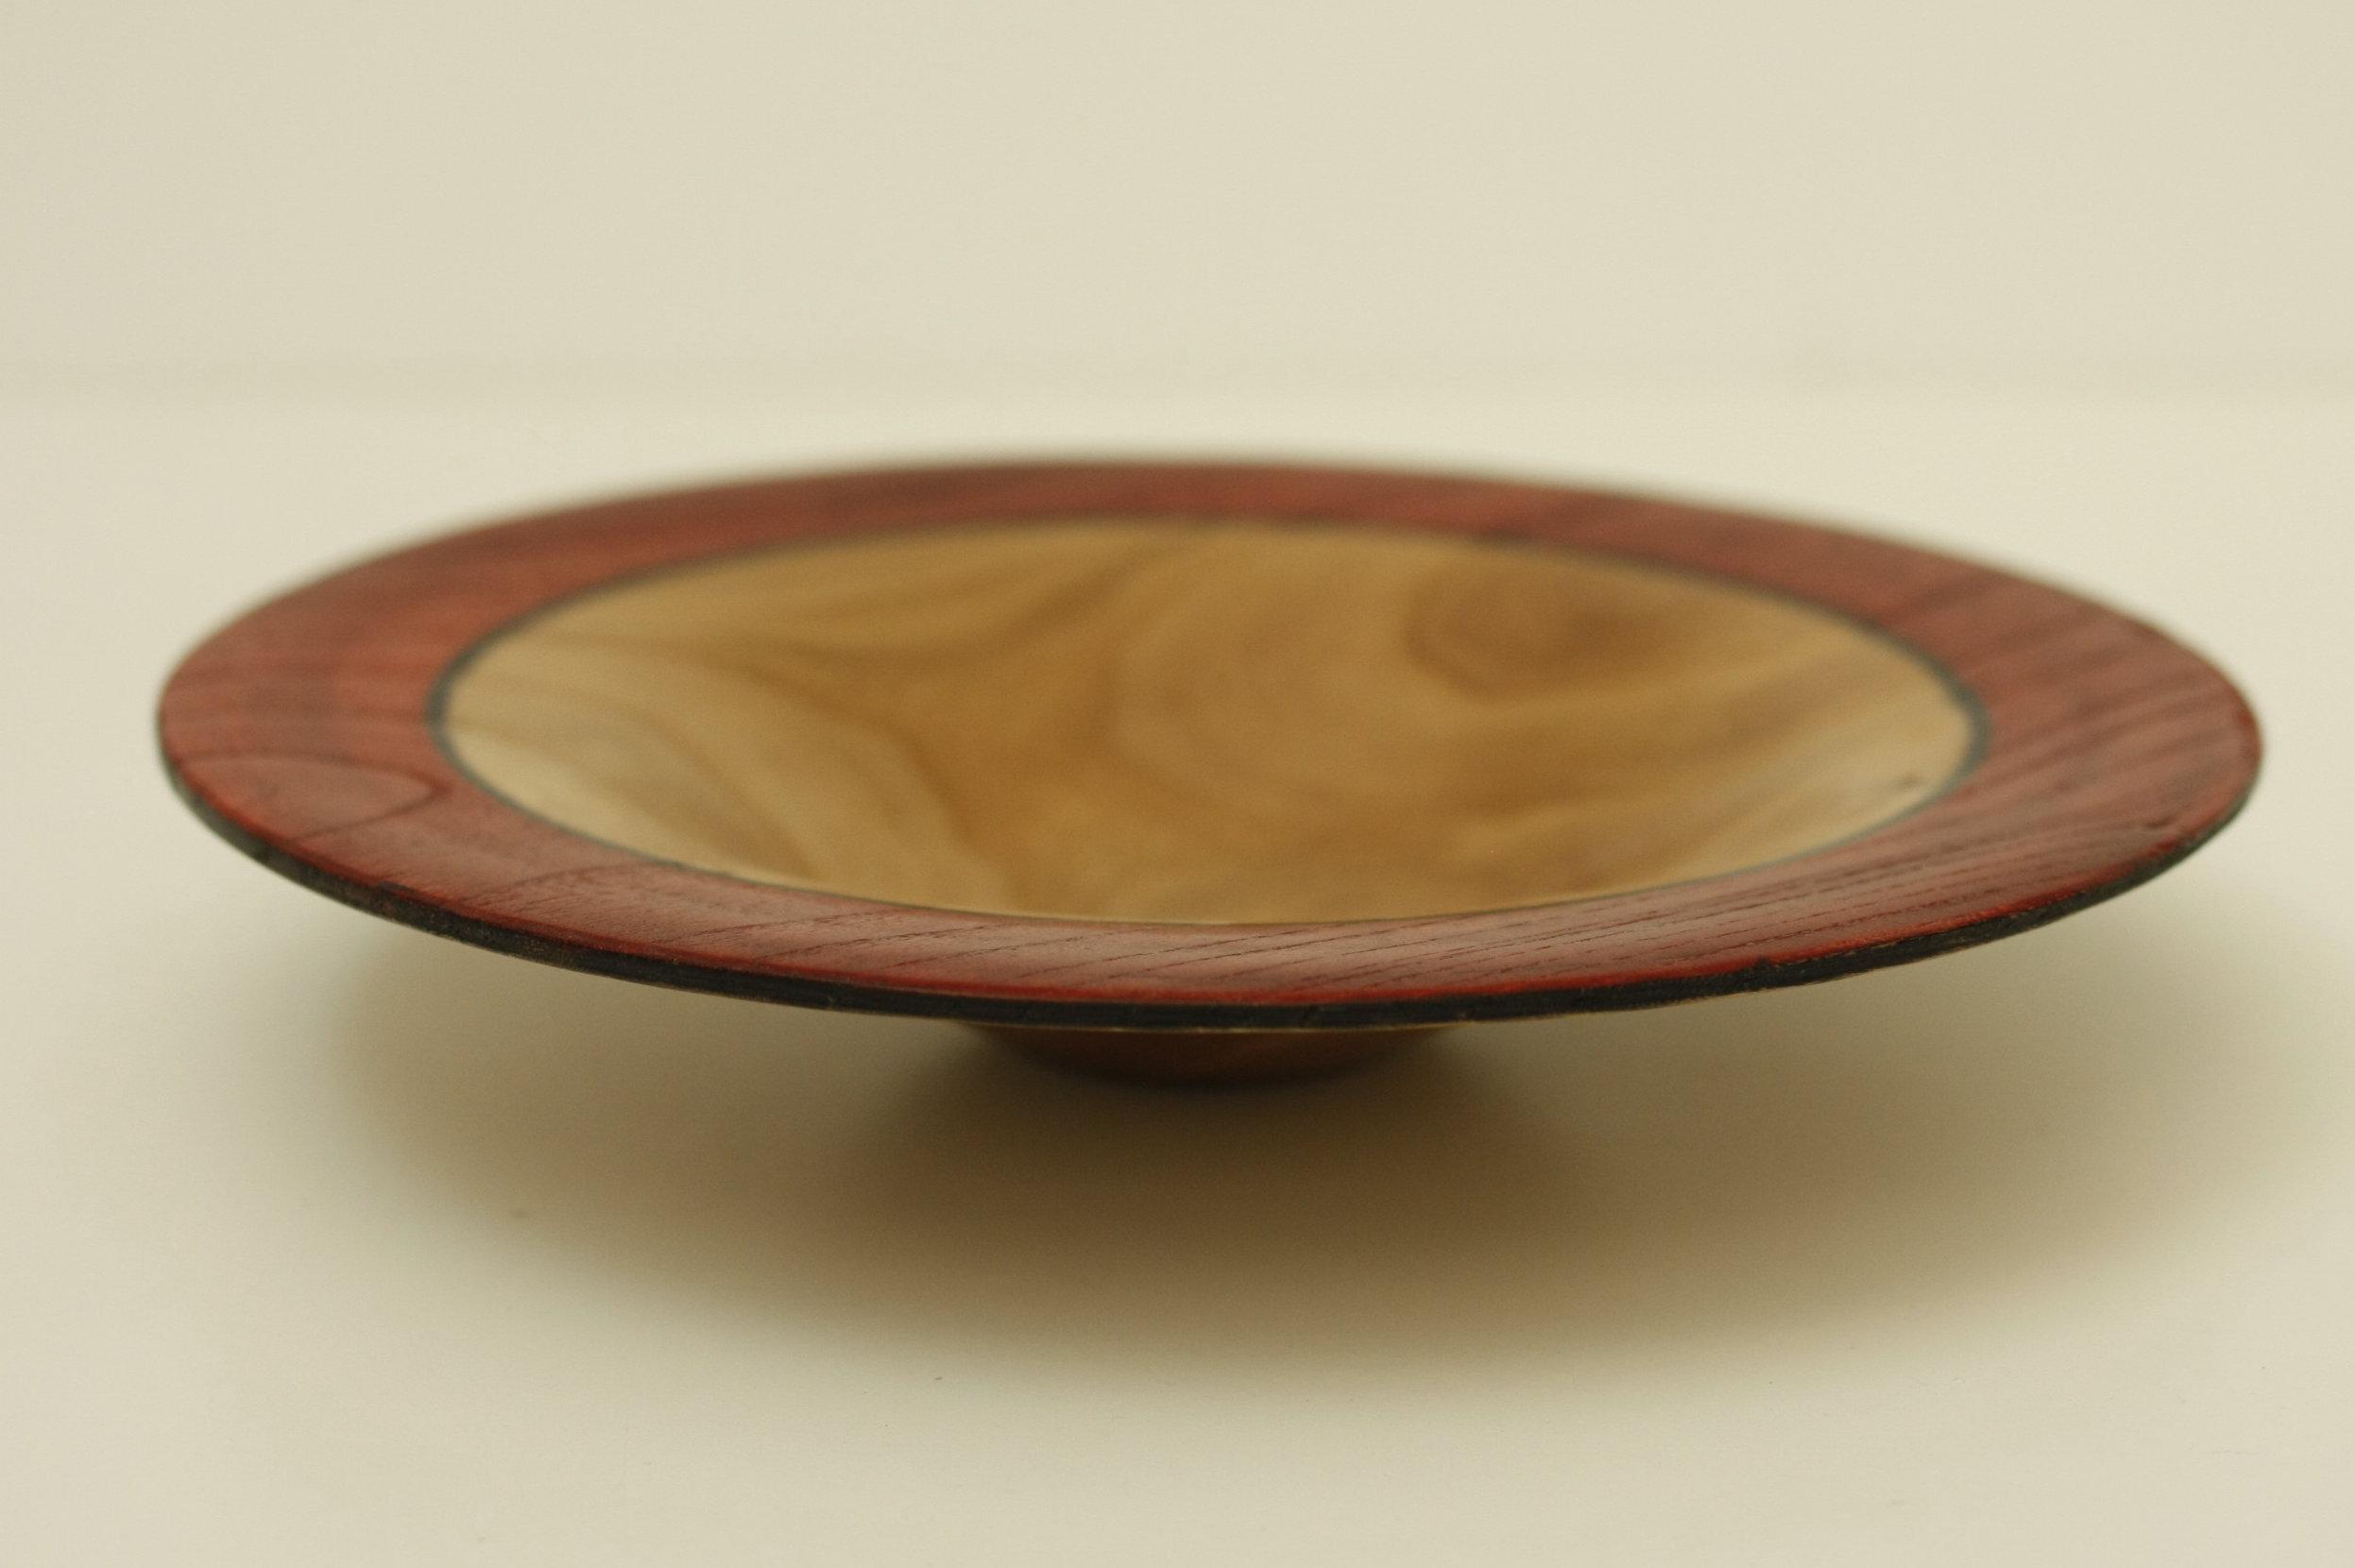 Joseph mcgill - dyed rim ash bowl.jpg